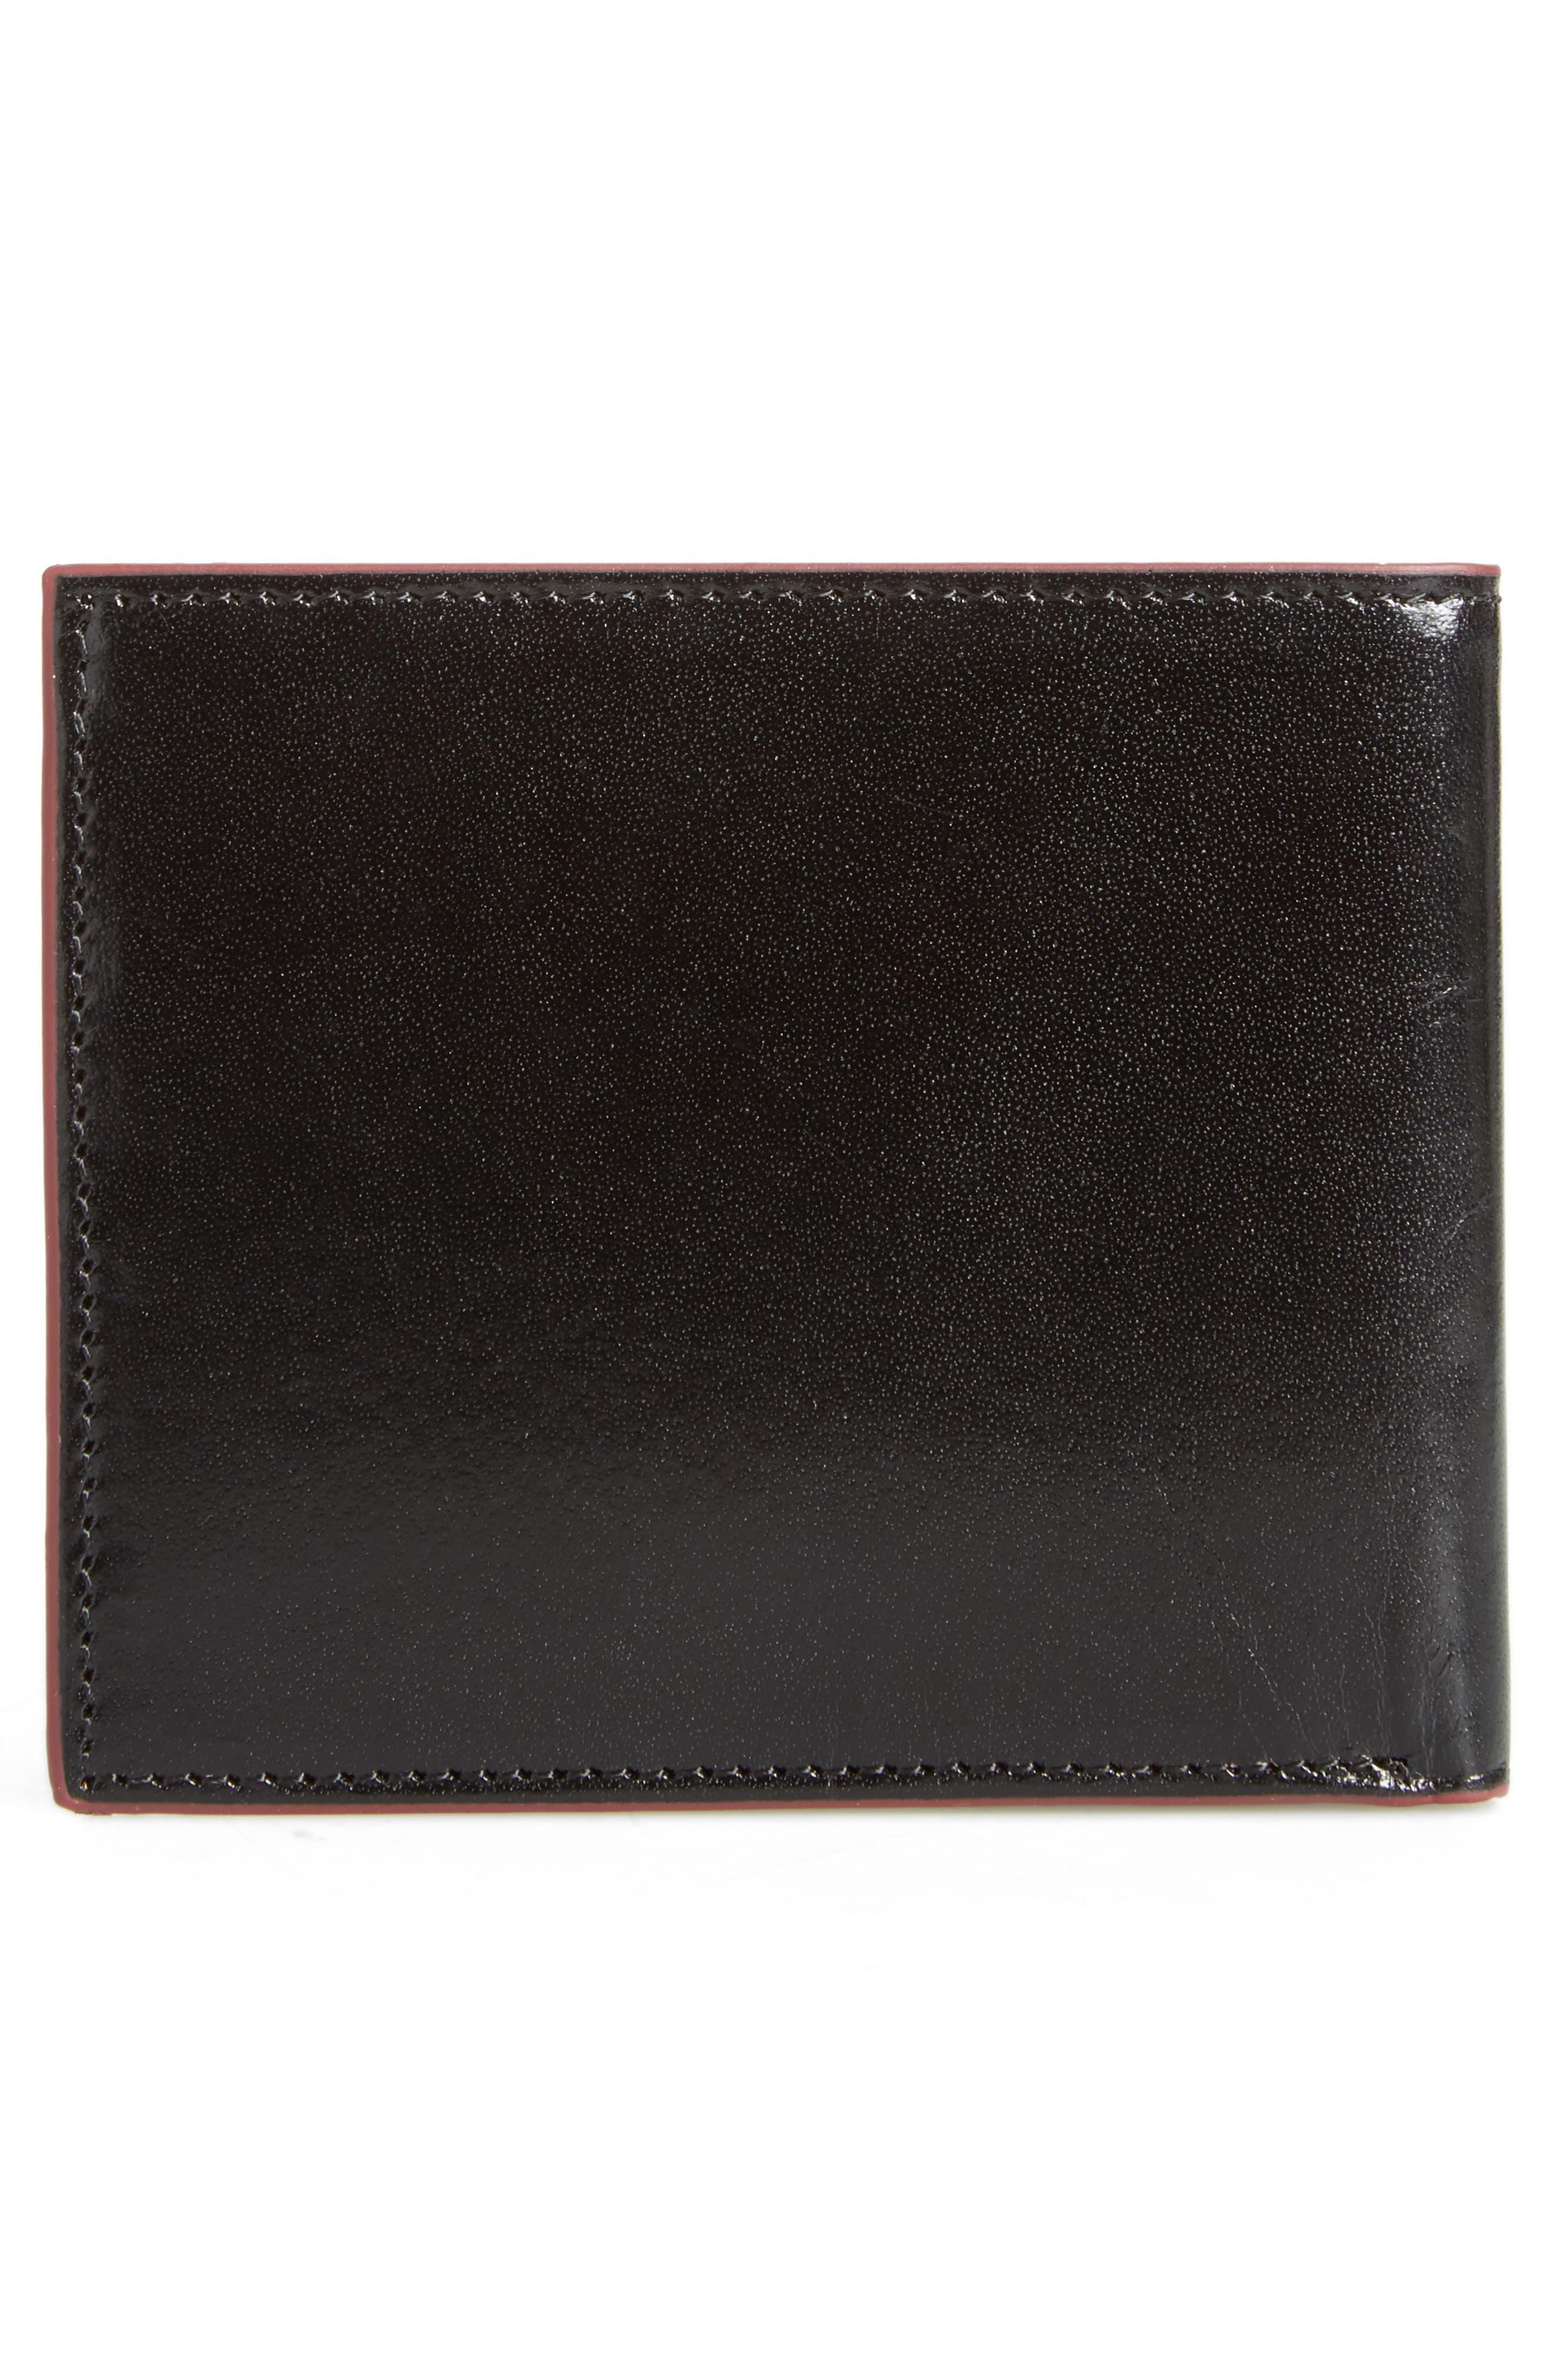 Loganz Leather Wallet,                             Alternate thumbnail 3, color,                             Black